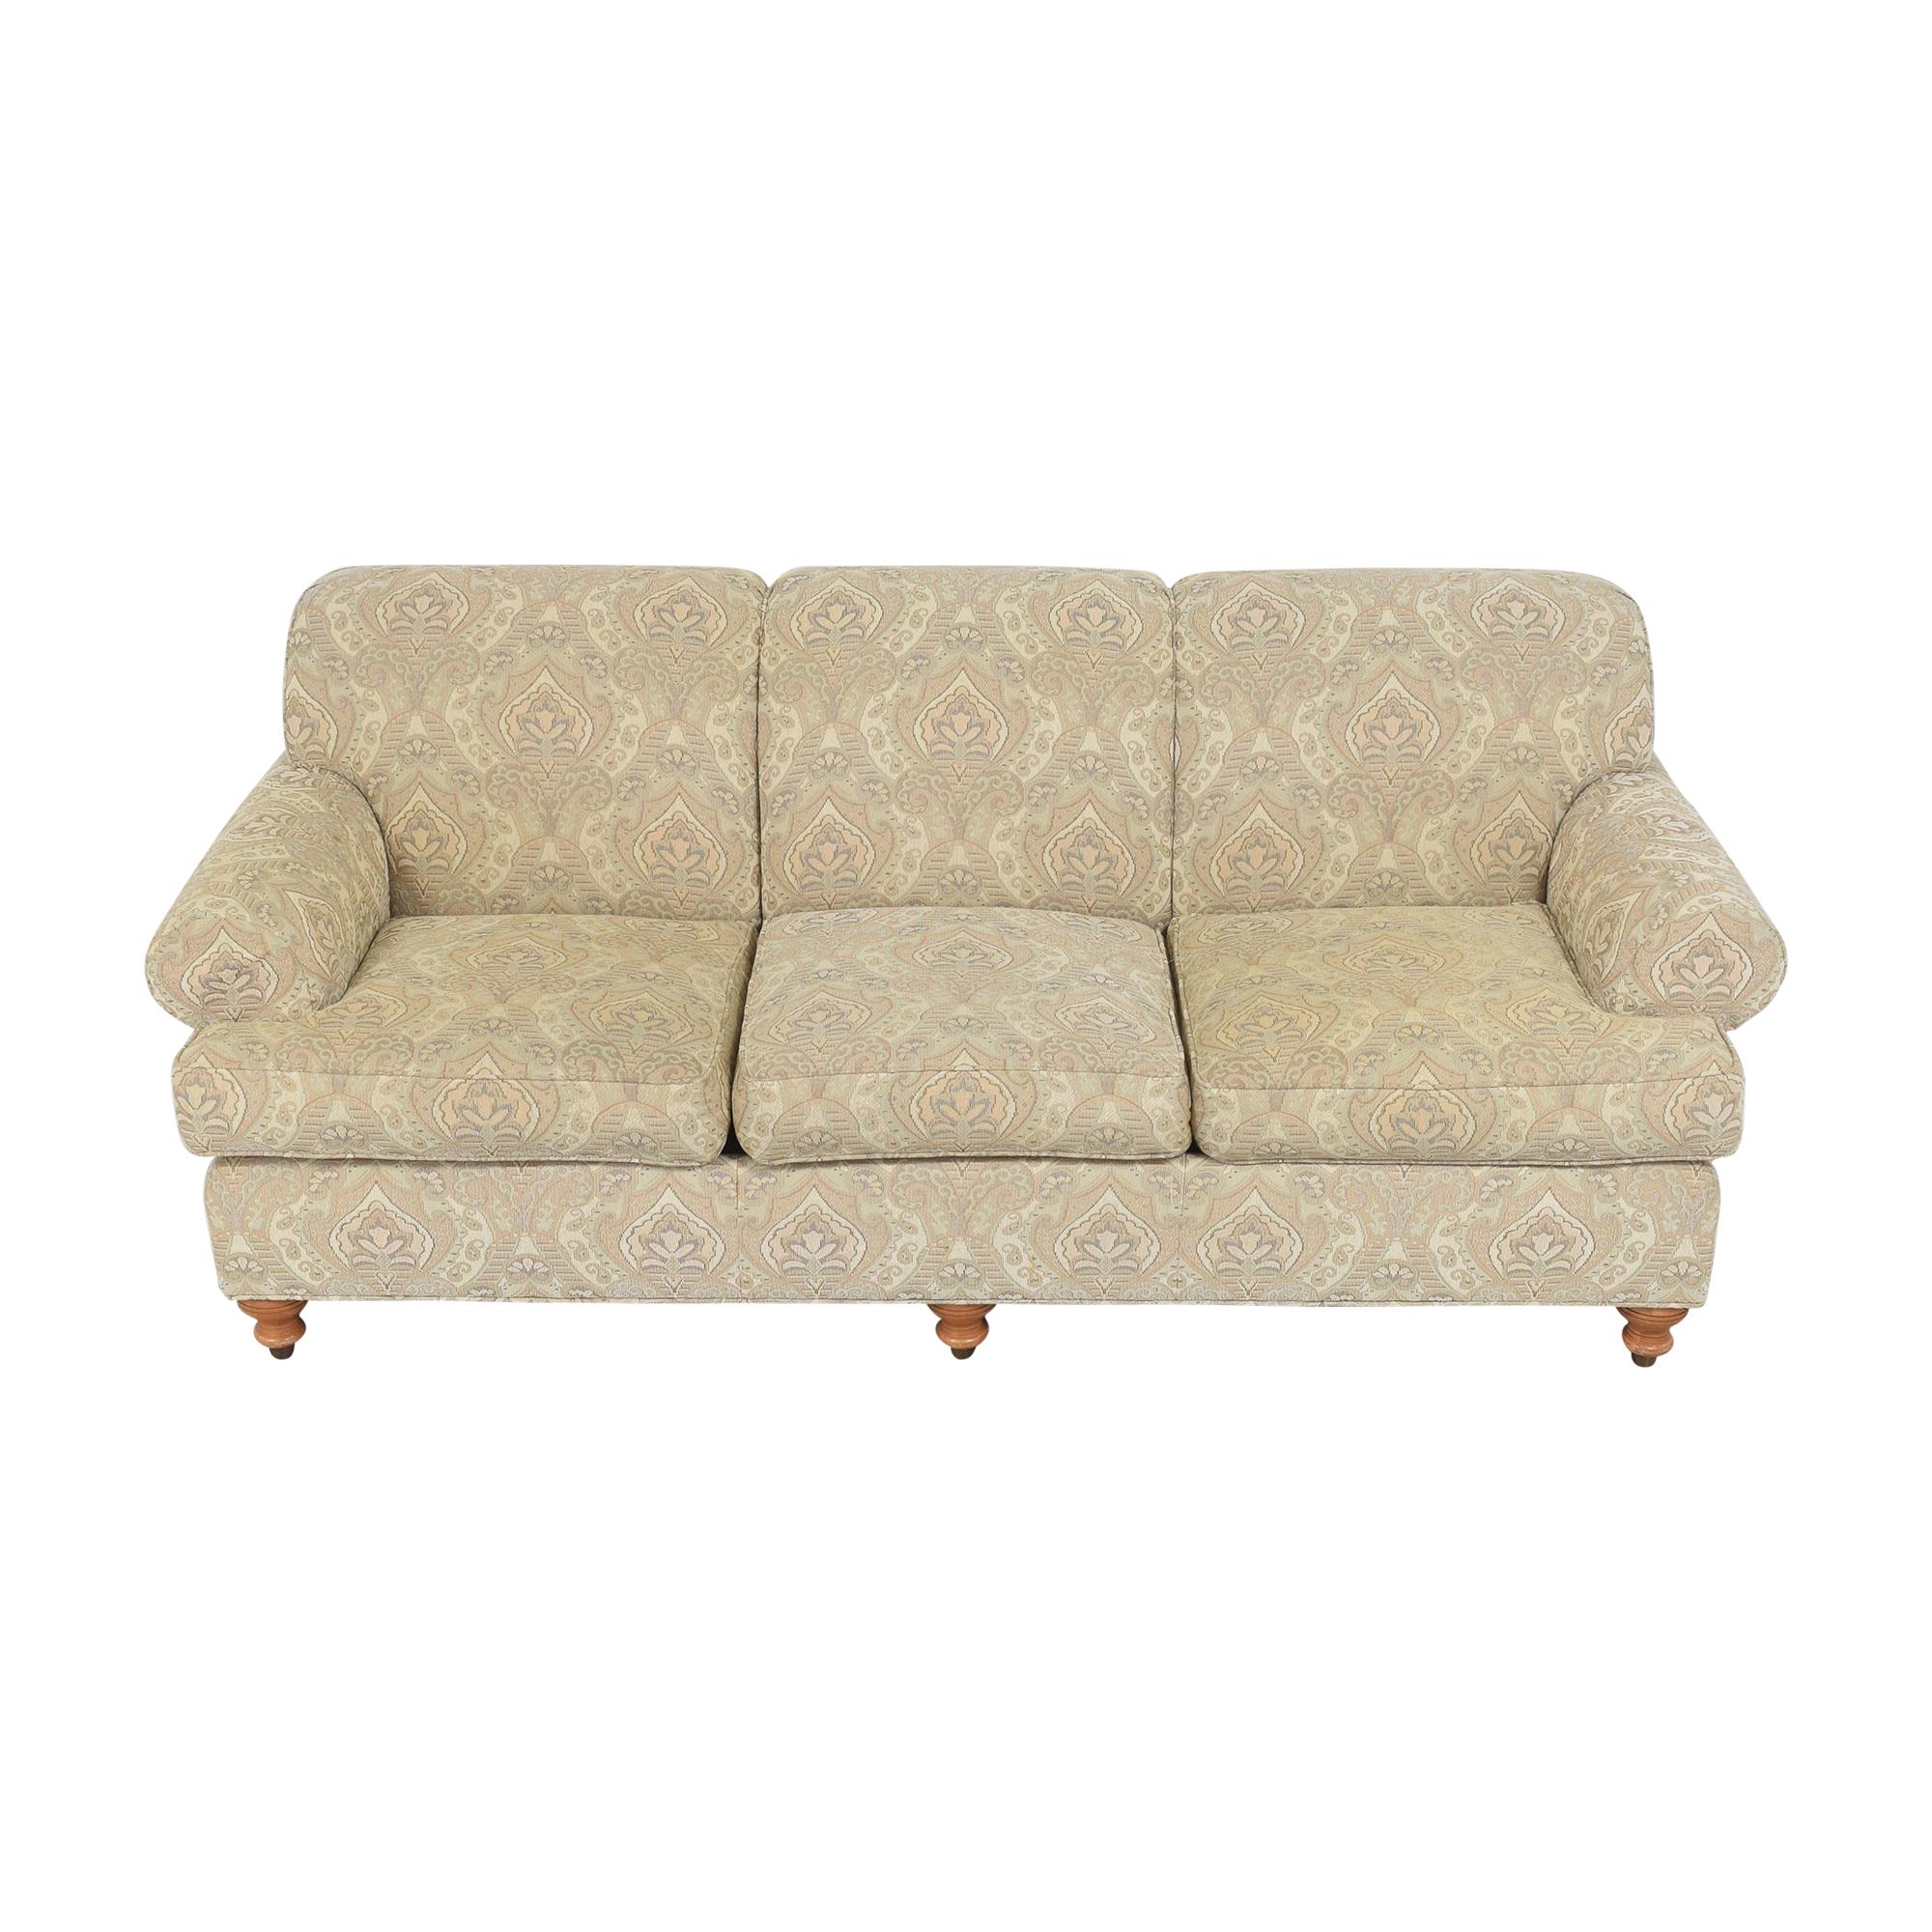 Ethan Allen Ethan Allen Patterned Roll Arm Sofa discount